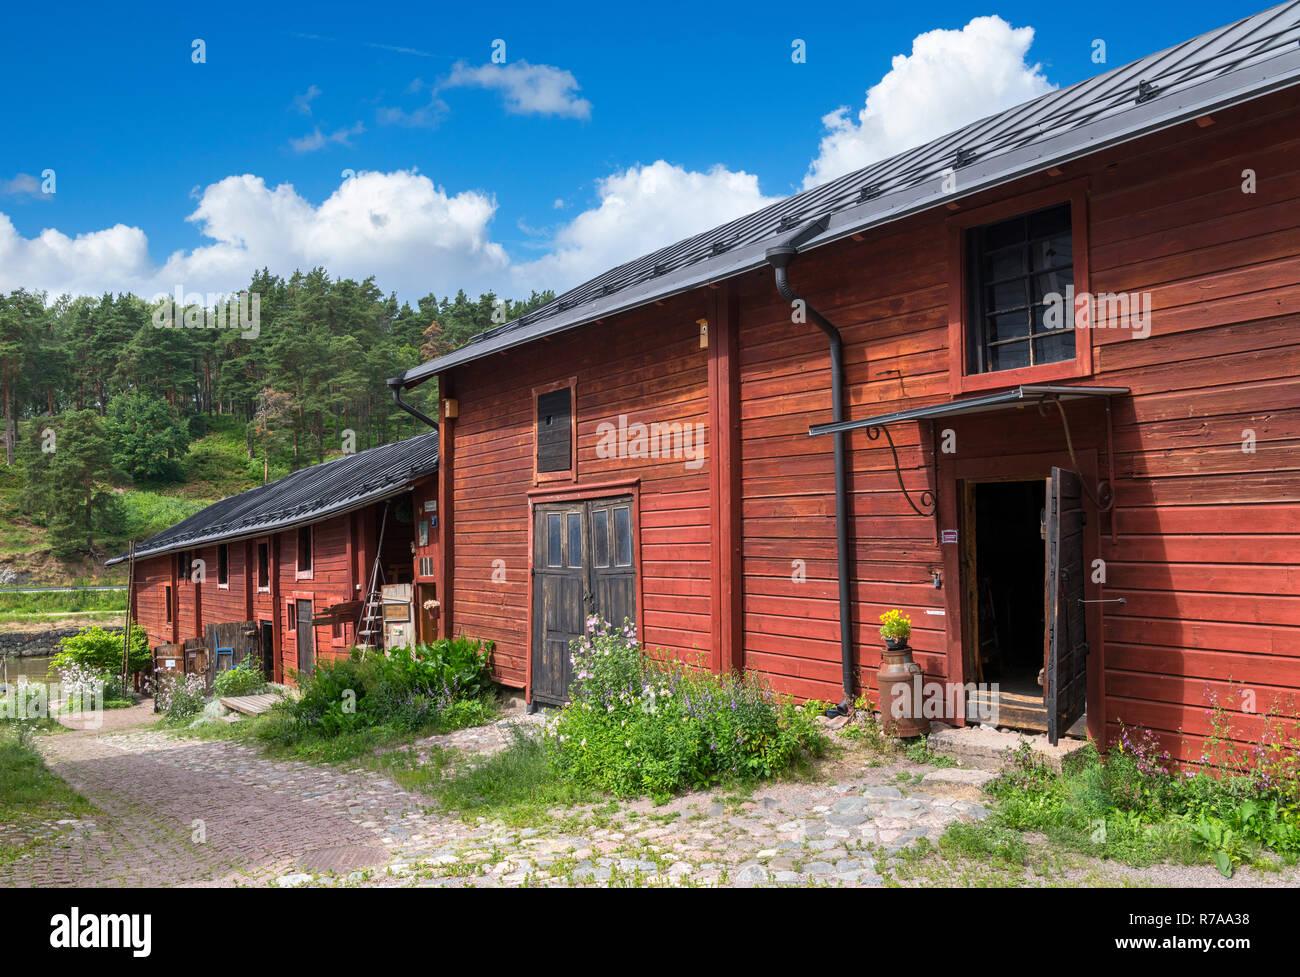 Historic wooden warehouses along the Porvoonjoki (Porvoo River), Old Town (Vanha Porvoo), Porvoo, Uusimaa, Finland - Stock Image